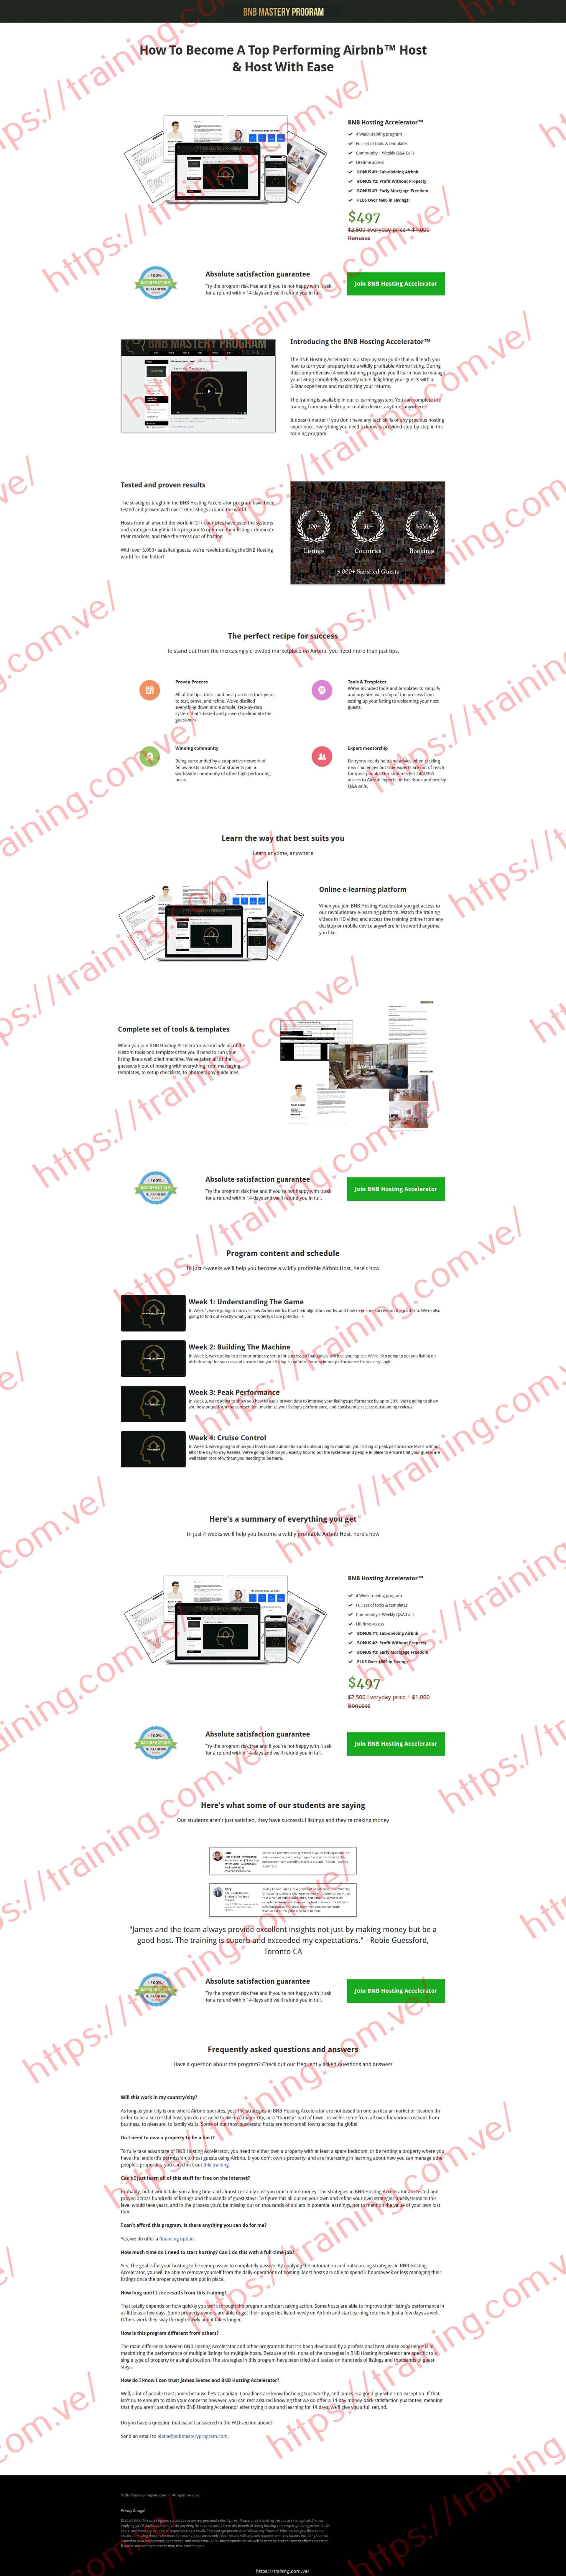 BNB Hosting Accelerator by James Svetec Sales page